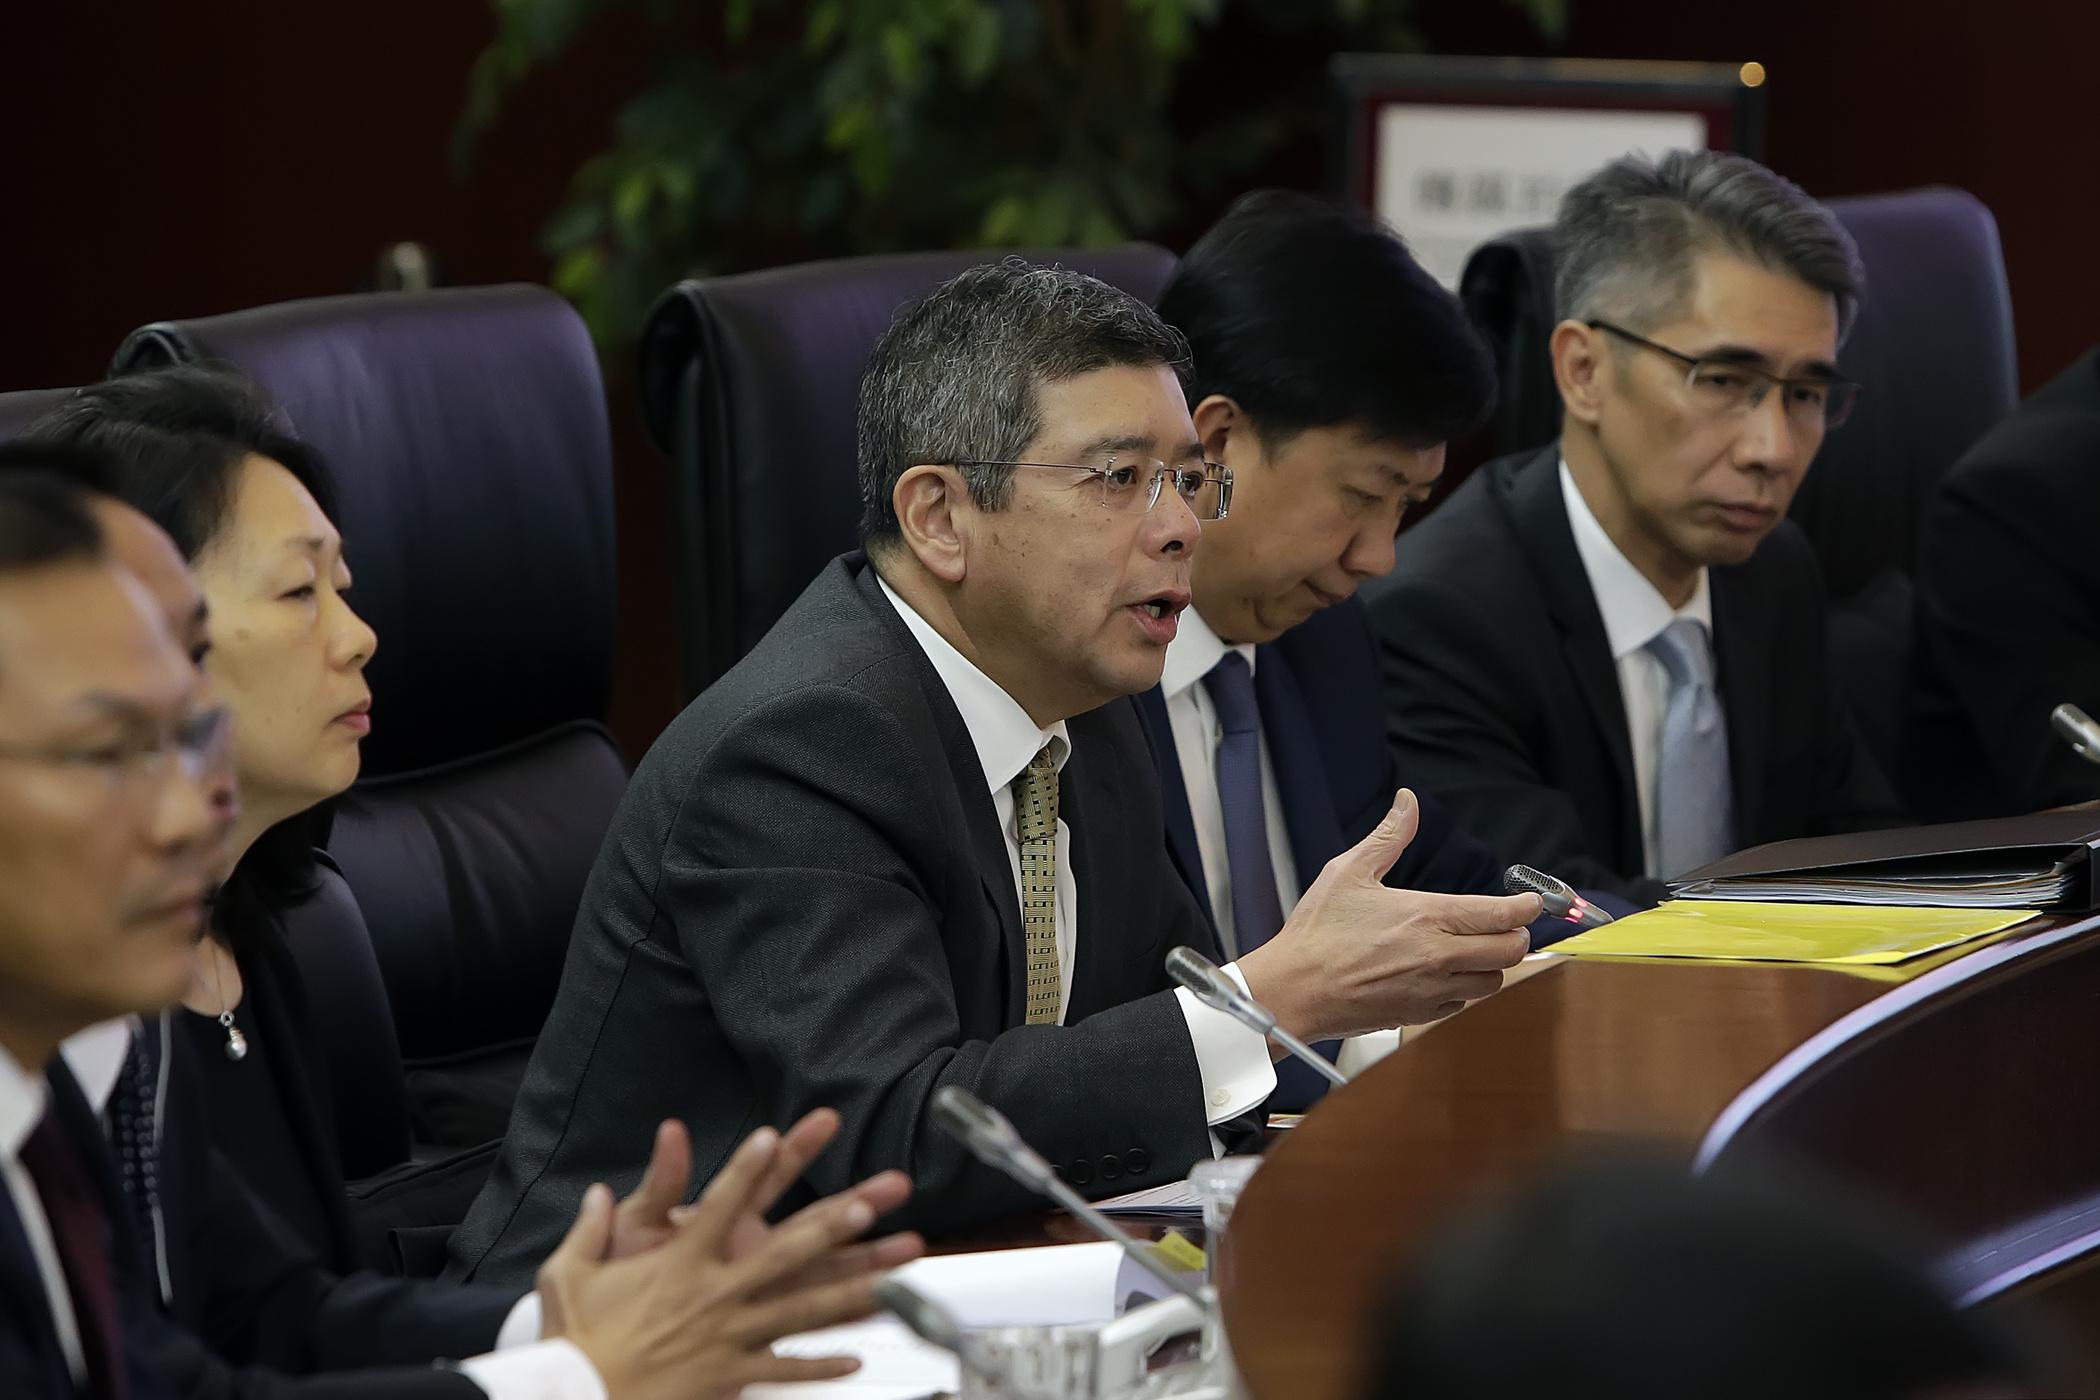 Táxis | Governo aguarda proposta de aumento de preços